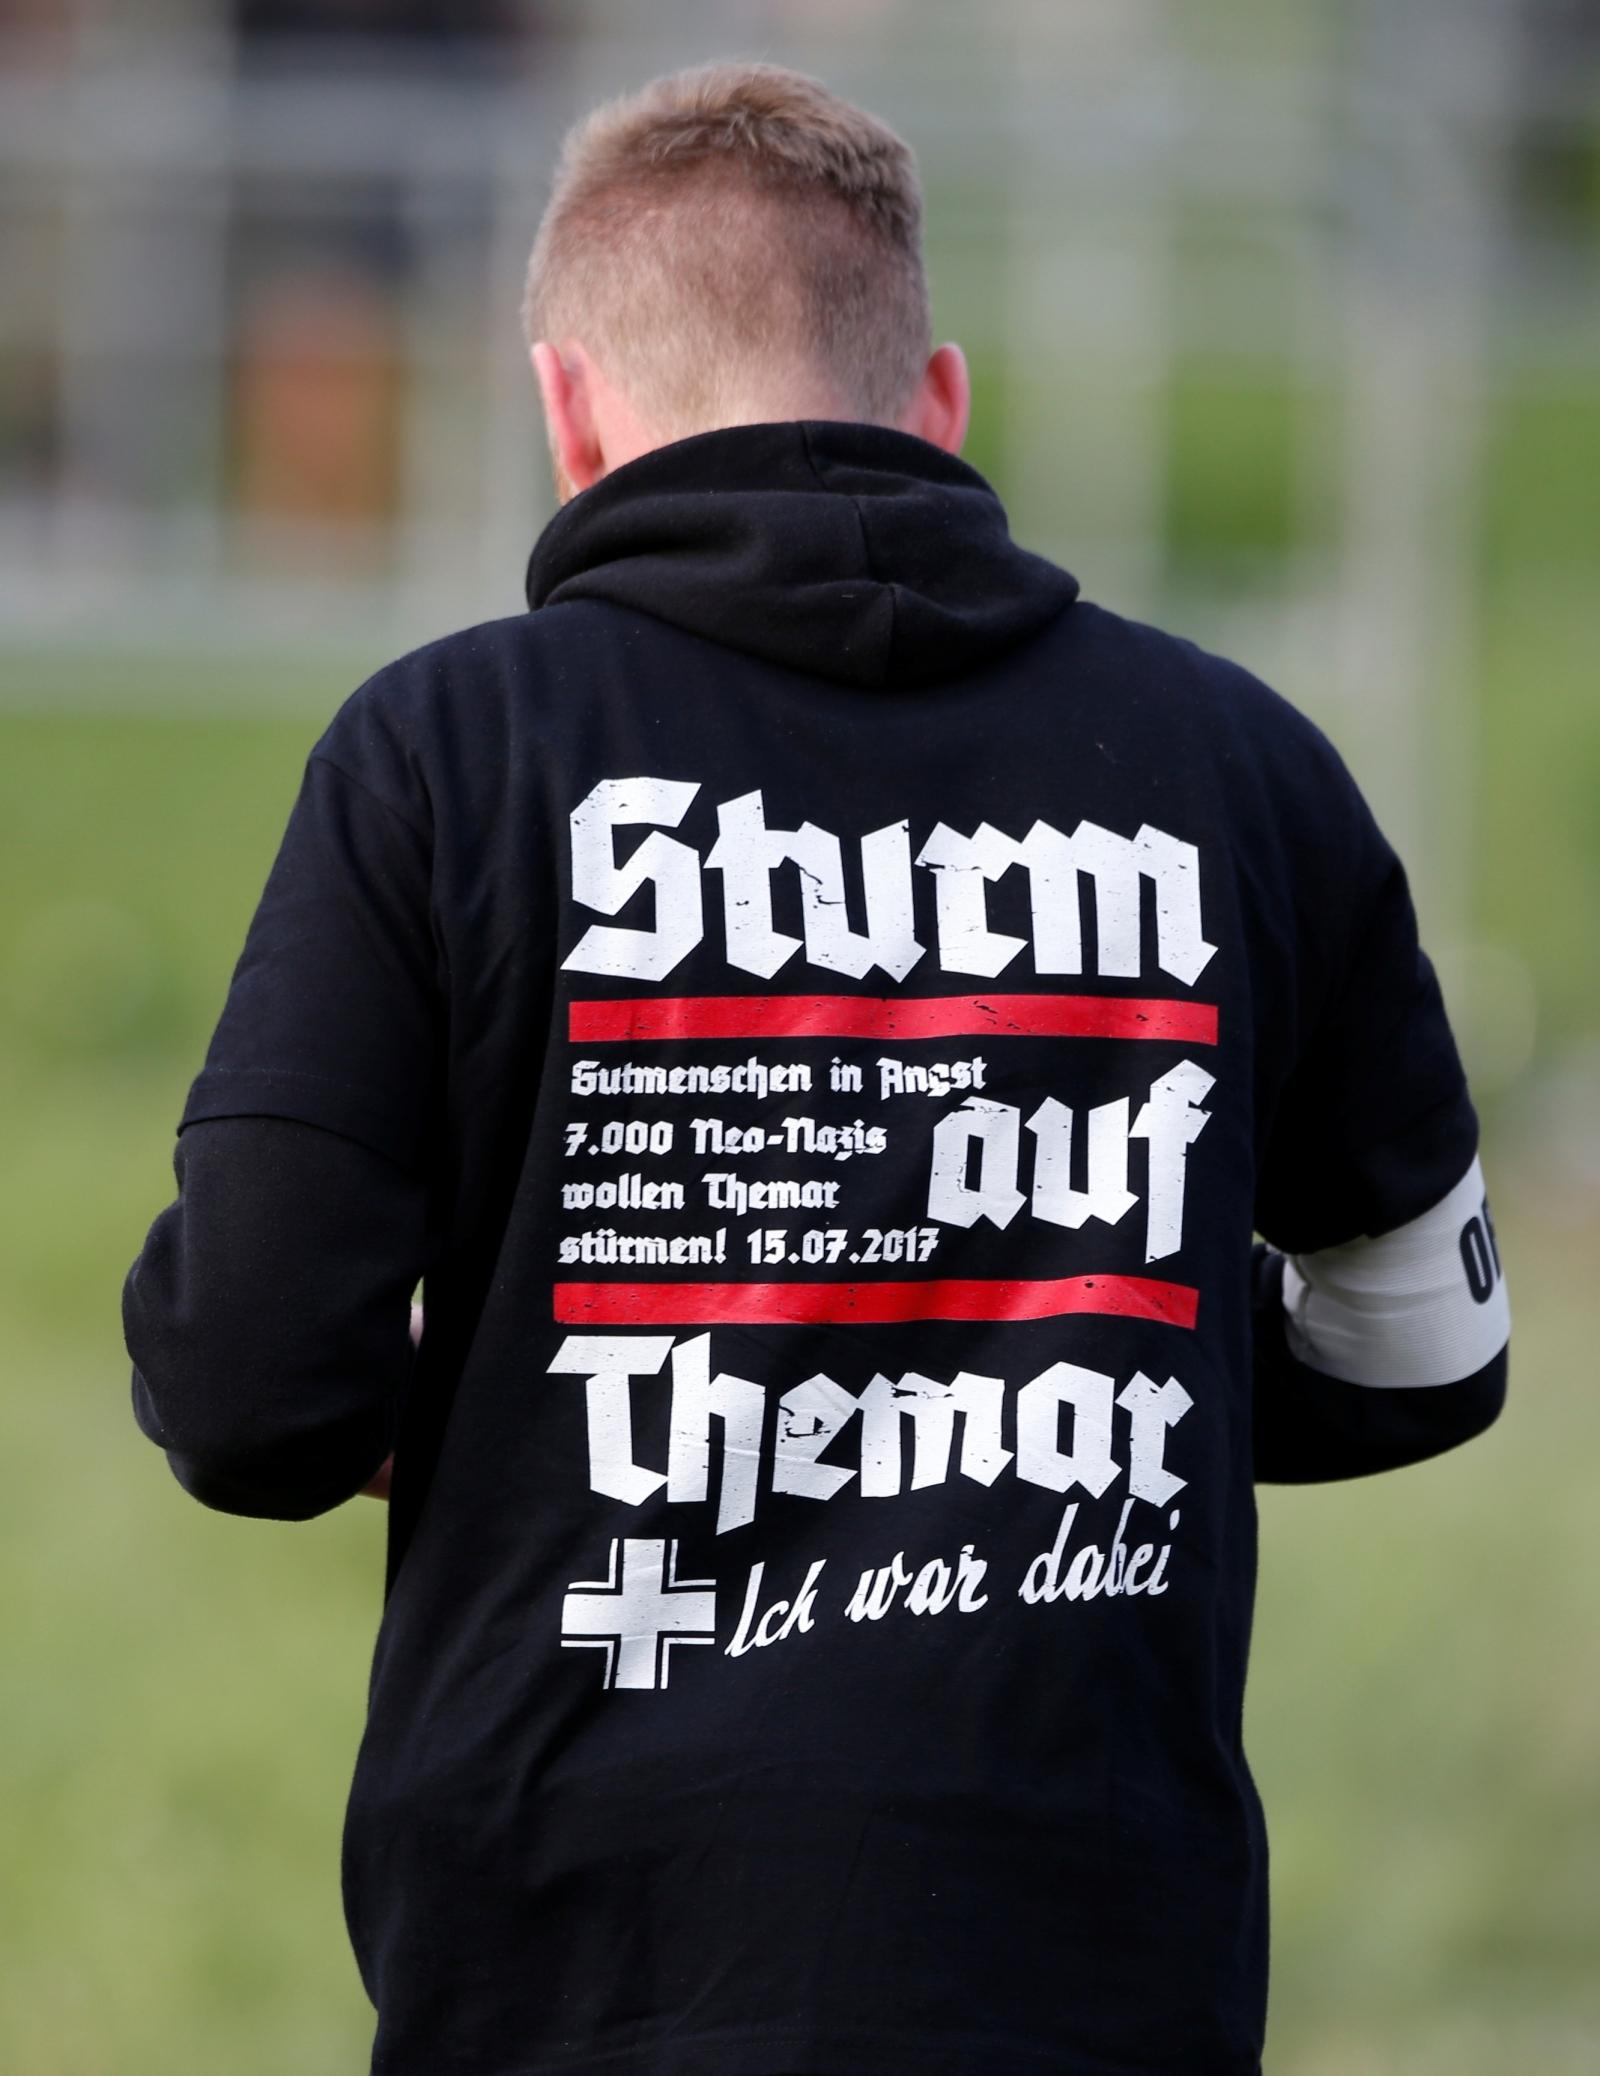 Neo-Nazi rock festival Germany